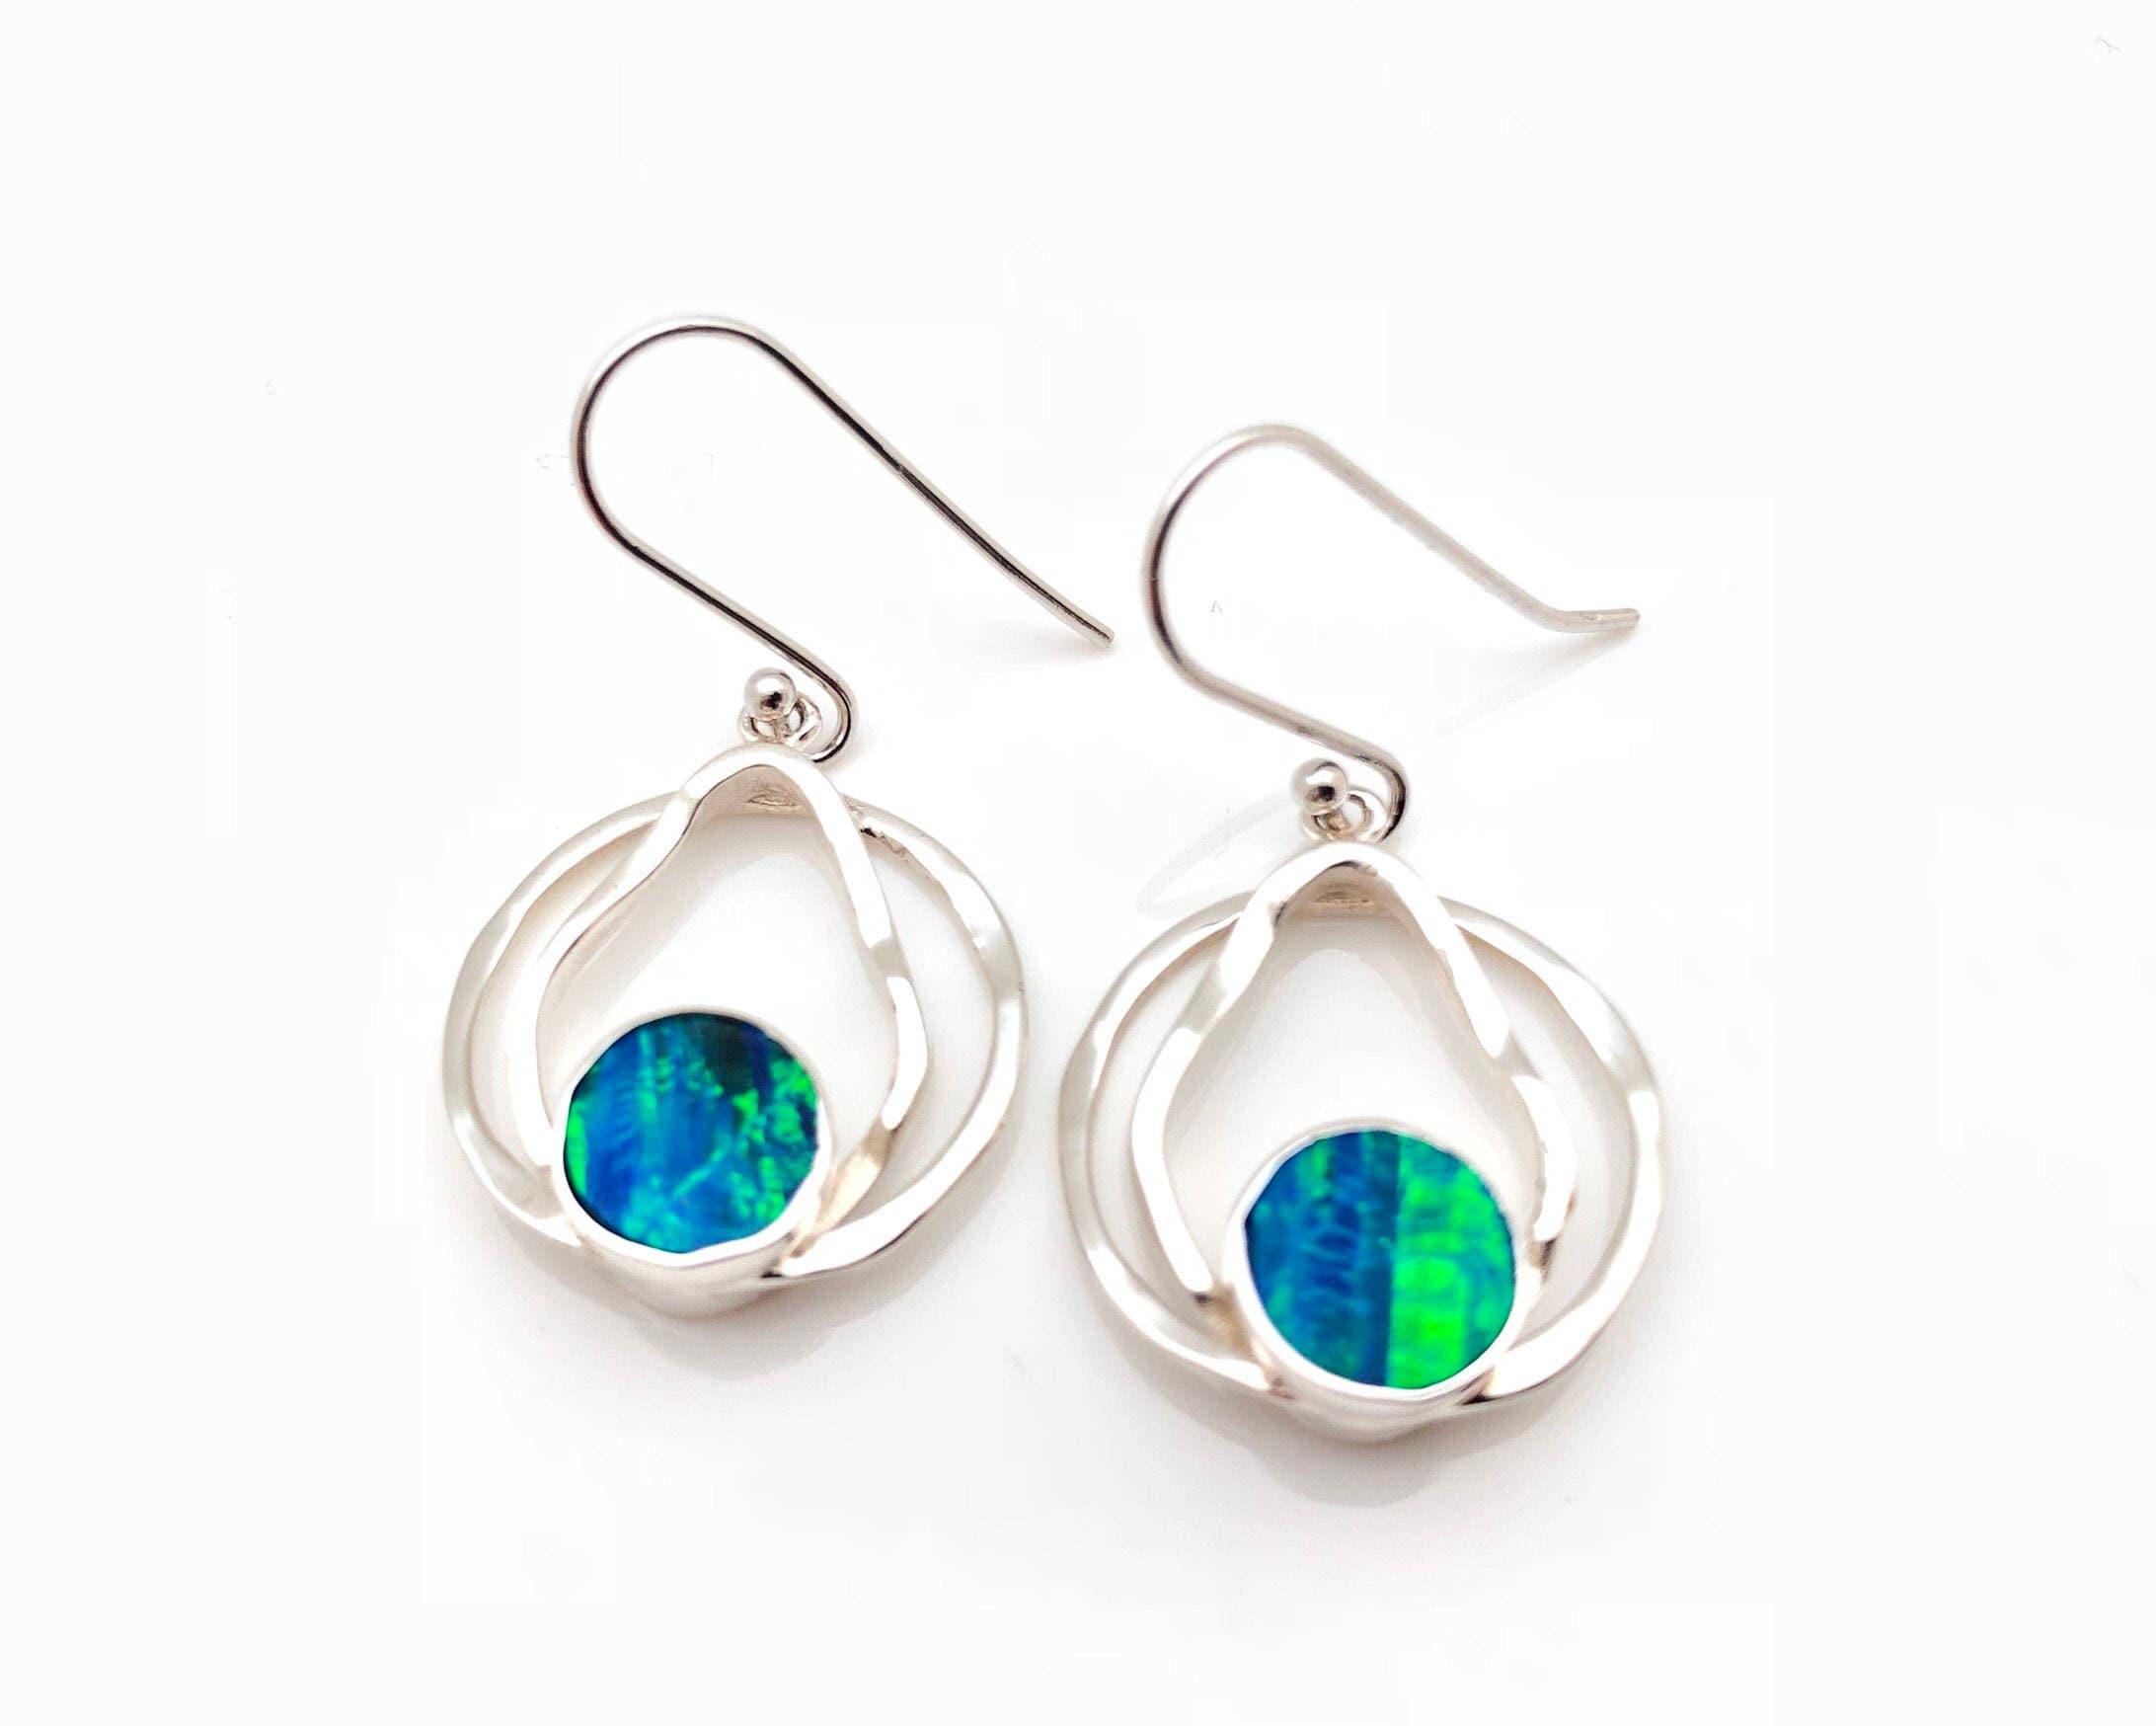 blue opal earrings 925 sterling silver round teardrop. Black Bedroom Furniture Sets. Home Design Ideas